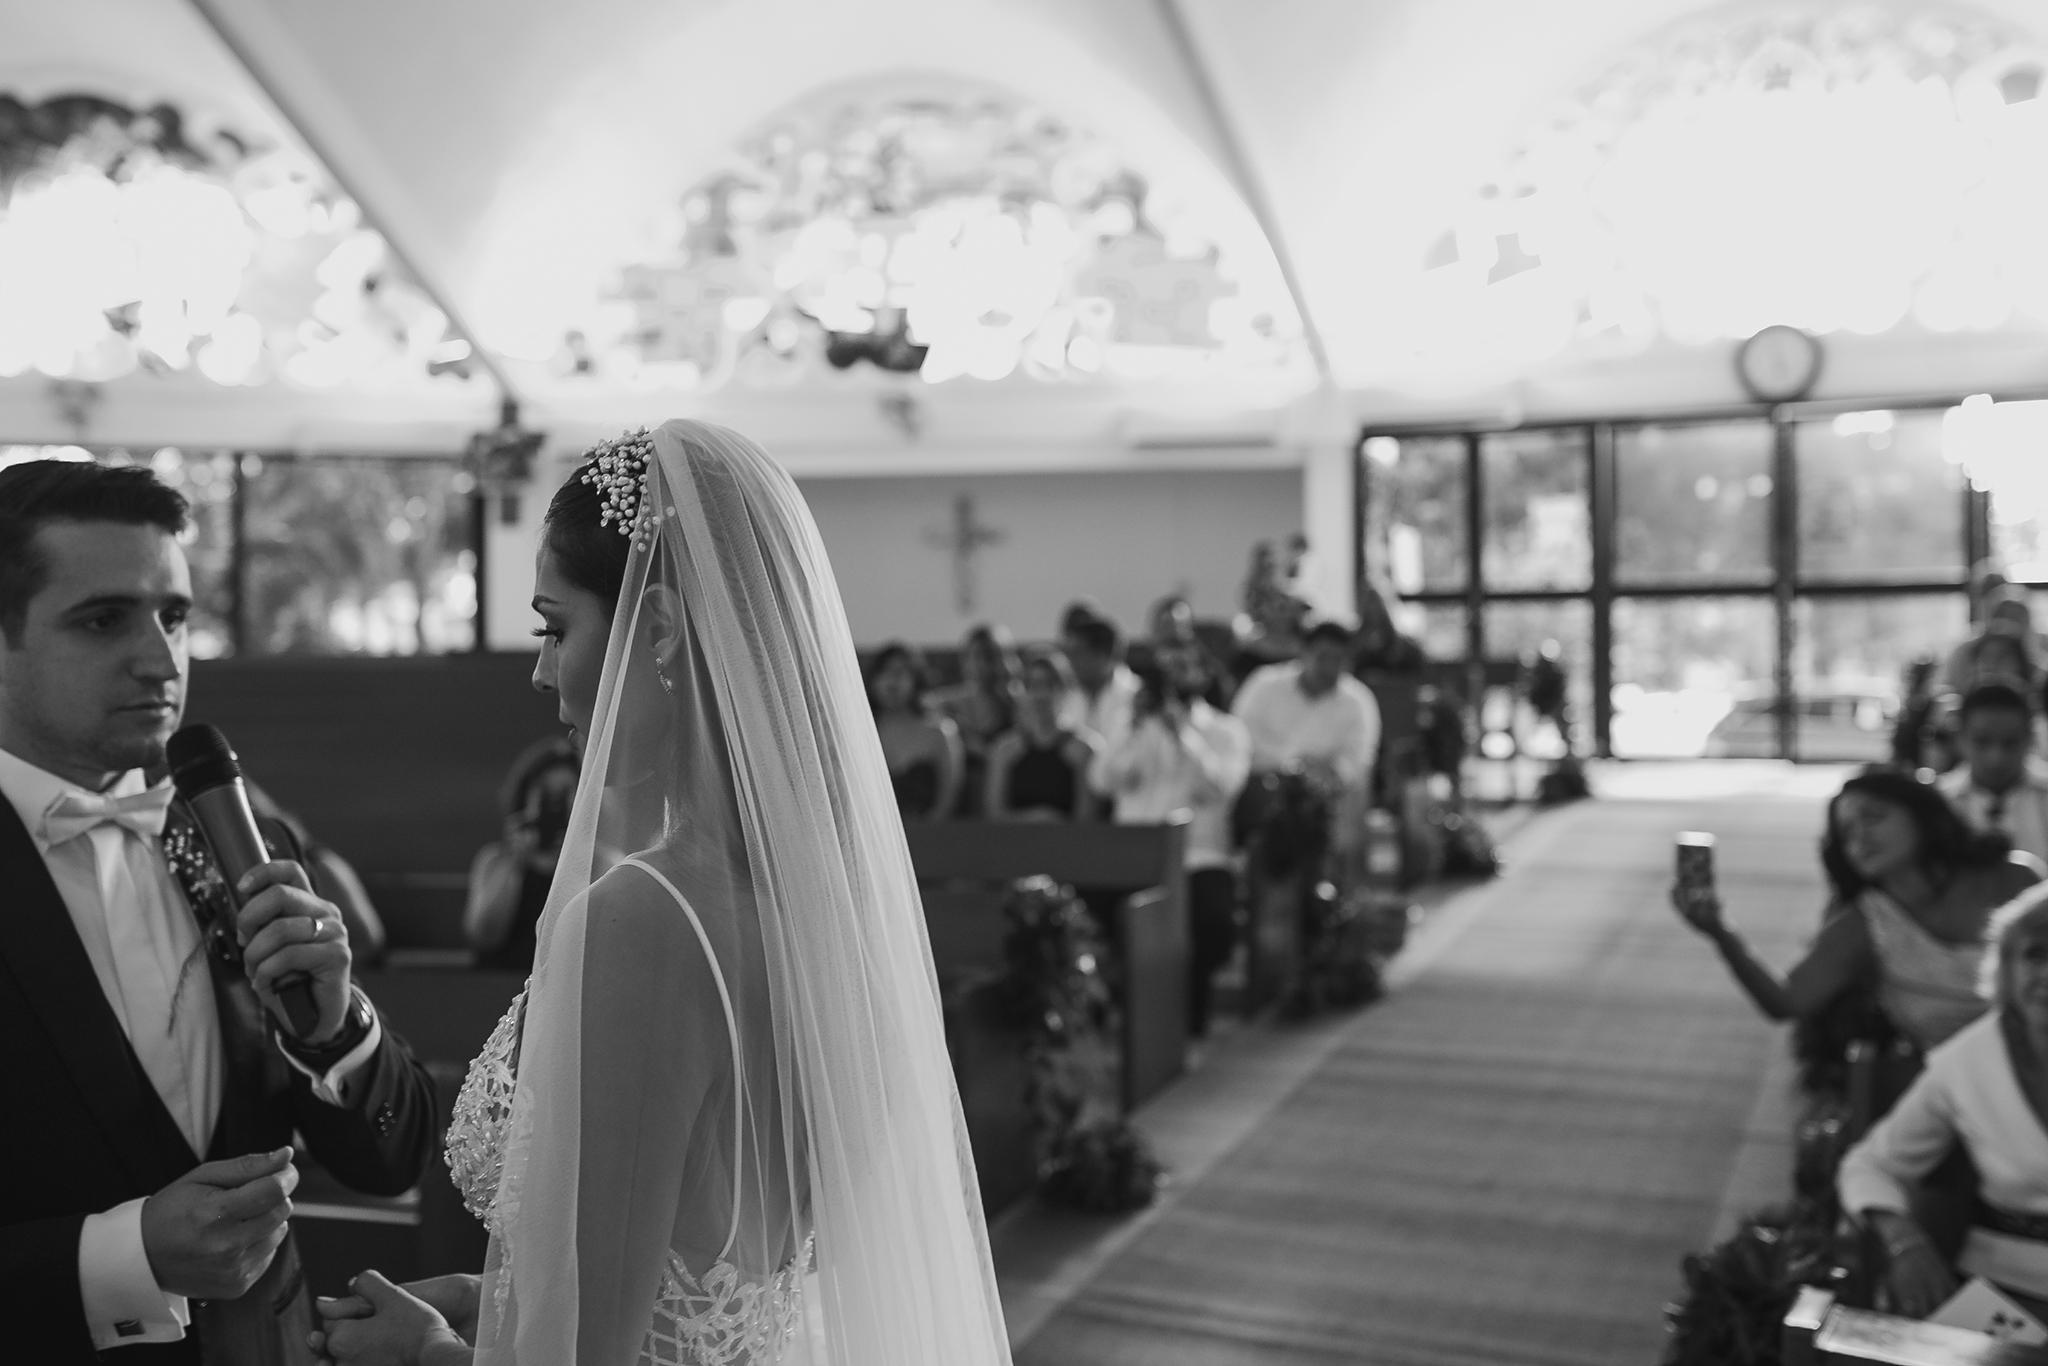 0668R&F__WeddingDestination_Weddingmerida_BodaMexico_FotografoDeBodas_FabrizioSimoneenFotografo.jpg